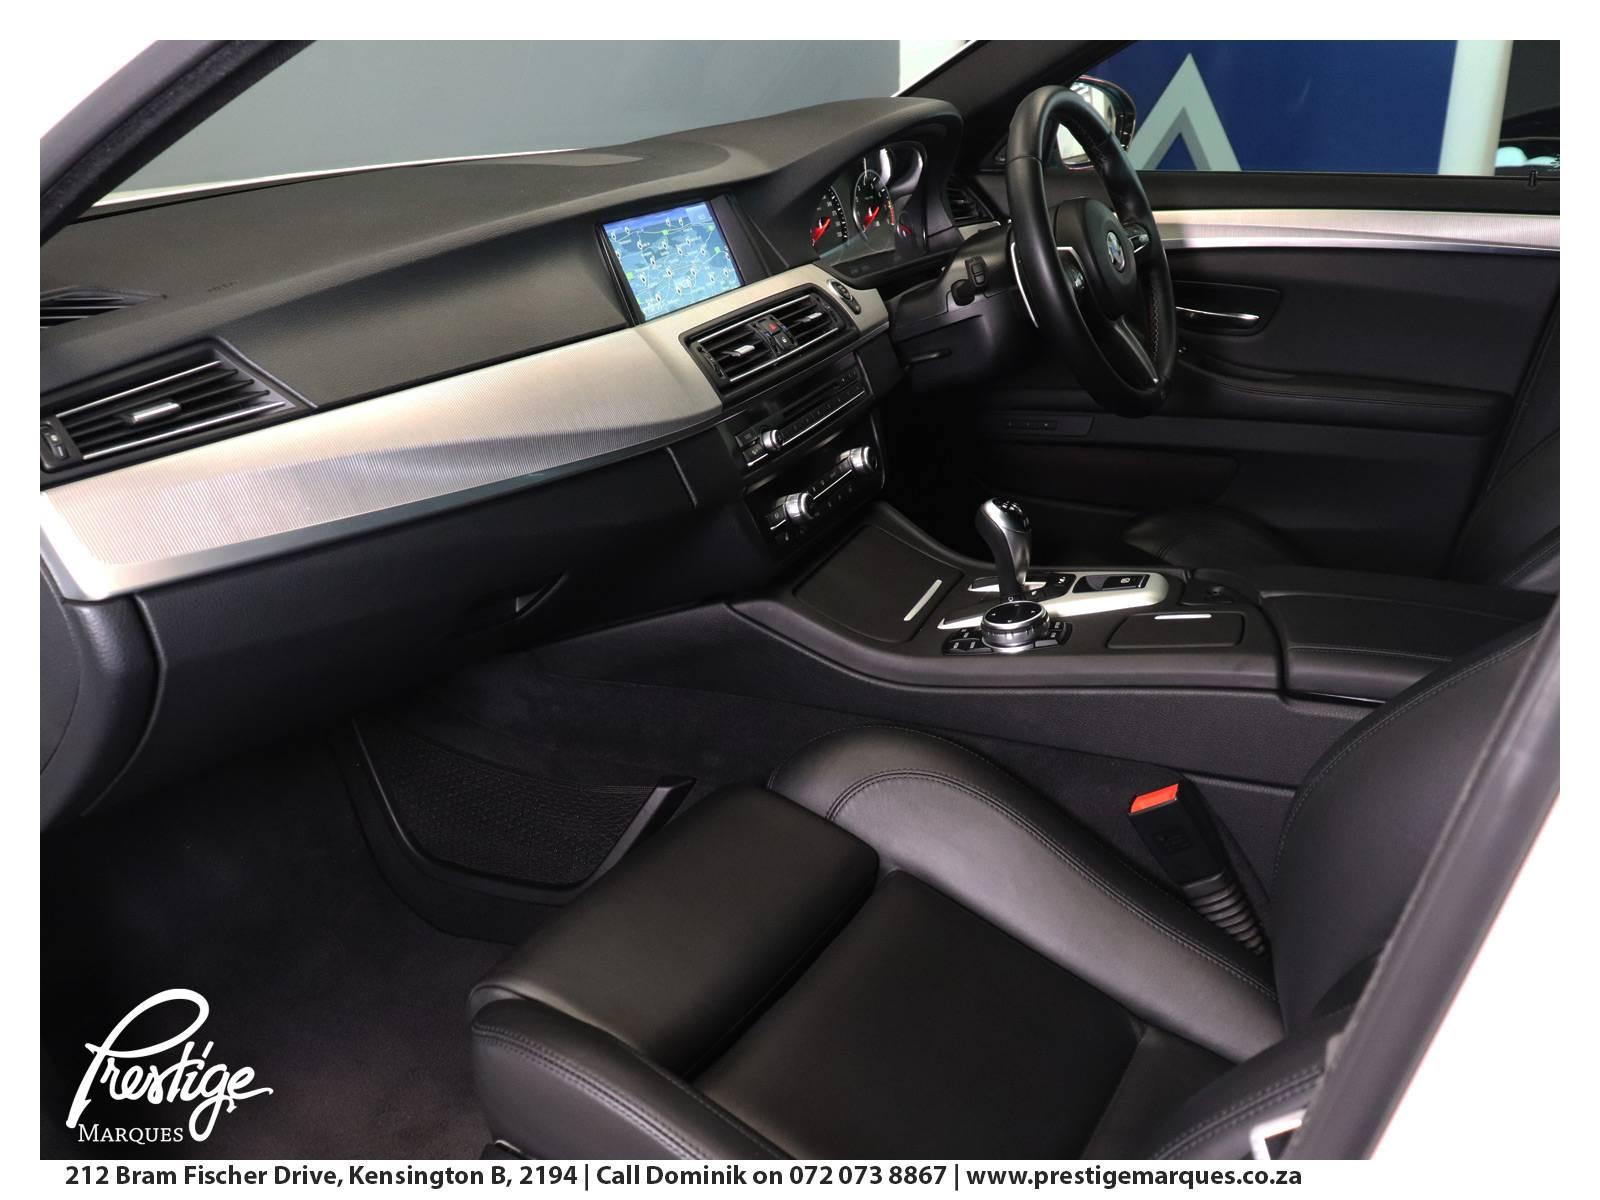 2015-BMW-F10-M5-MDCT-Prestige-Marques-Randburg-Sandton-14